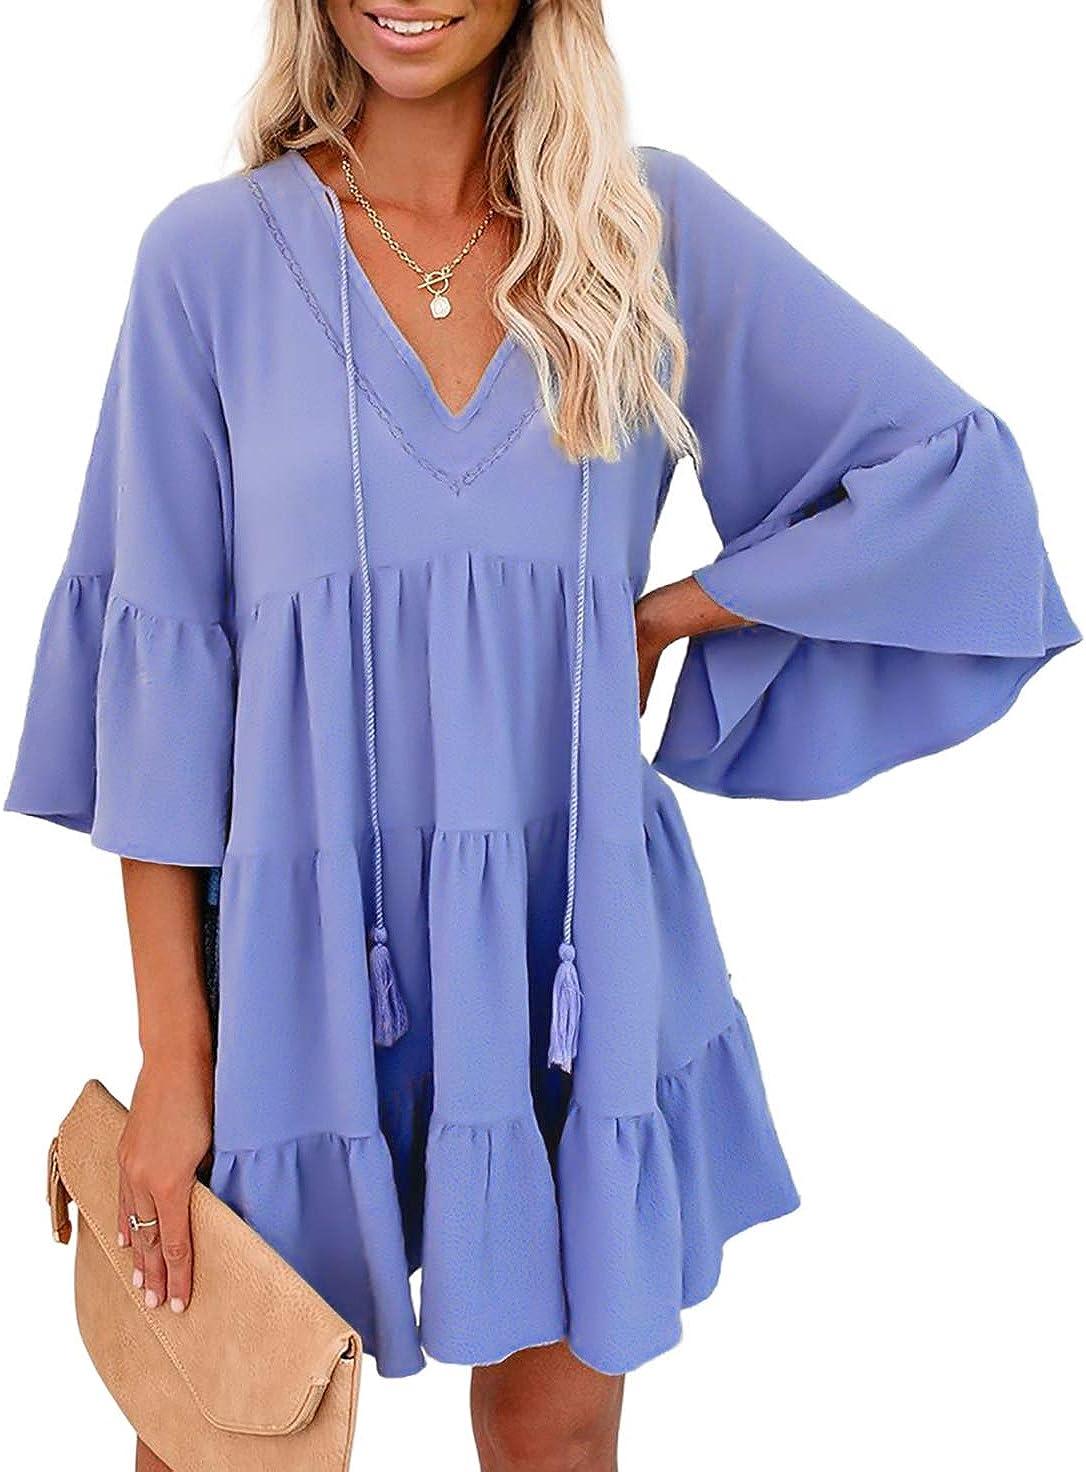 BTFBM Women Casual Babydoll Dresses V Neck Ruffle Bell Short Sleeve Tassel Drawstring Summer Solid Swing Mini Dress